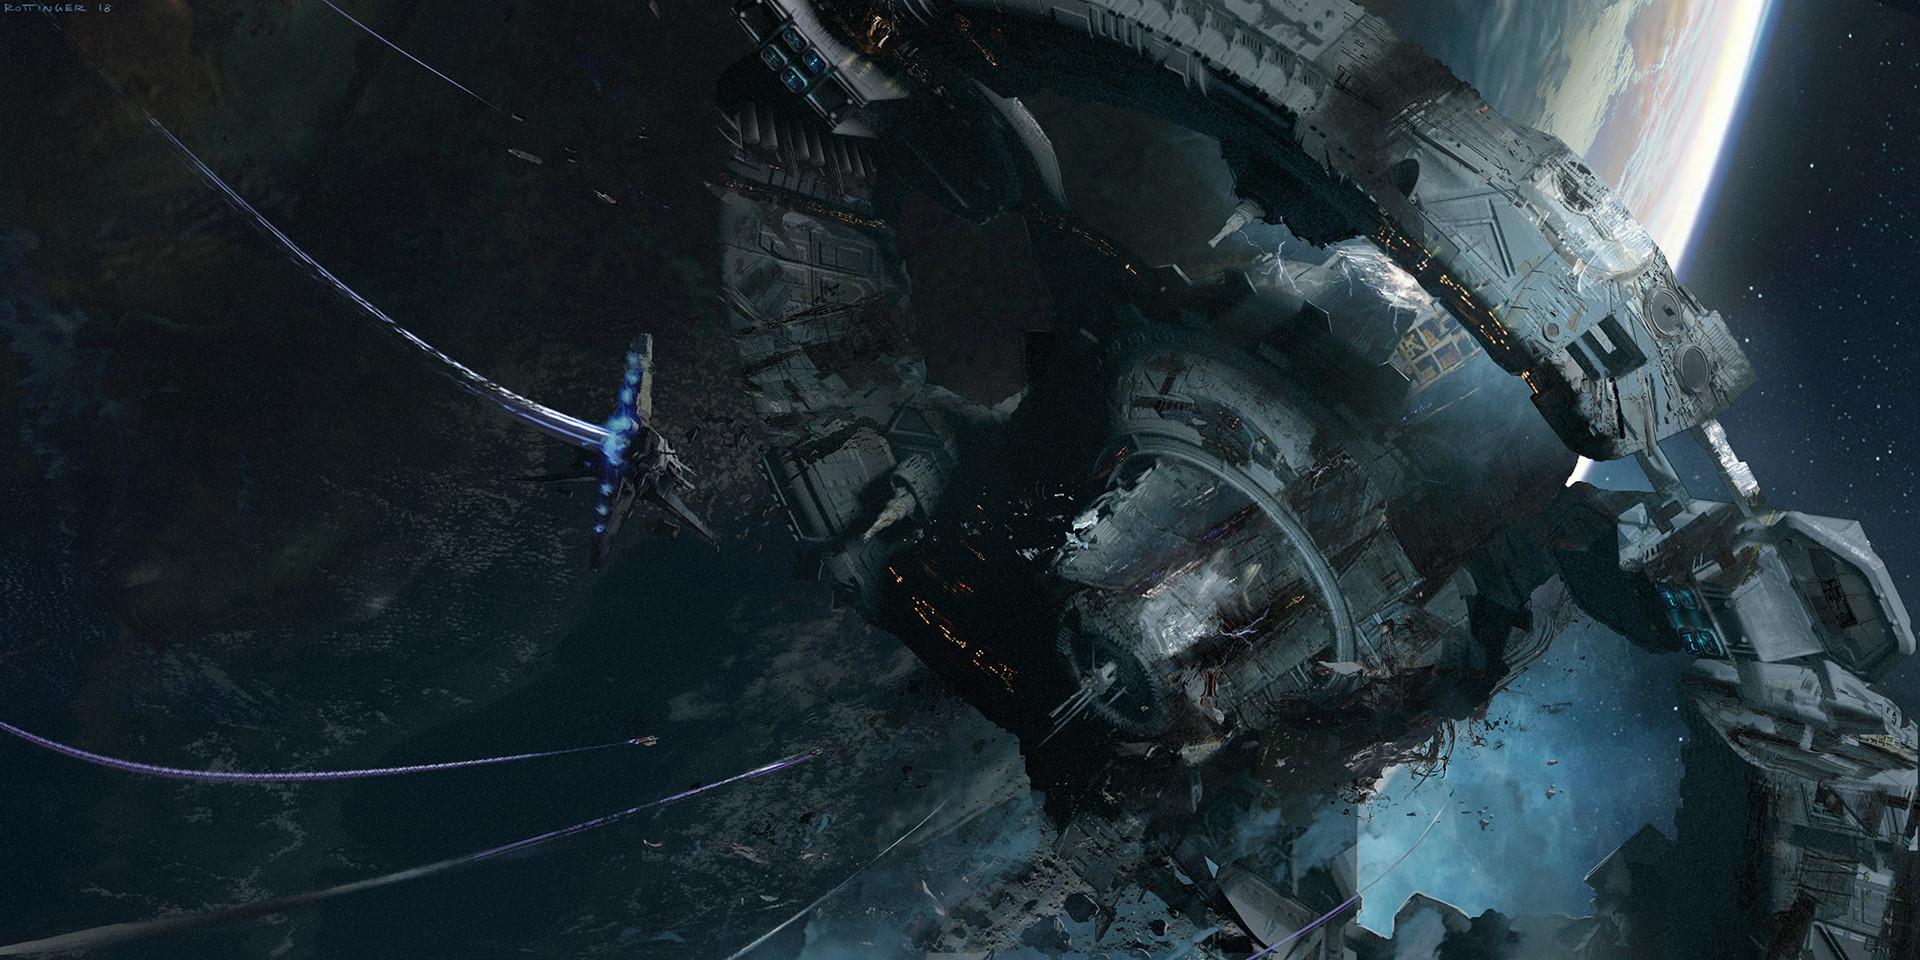 Blake rottinger space station web